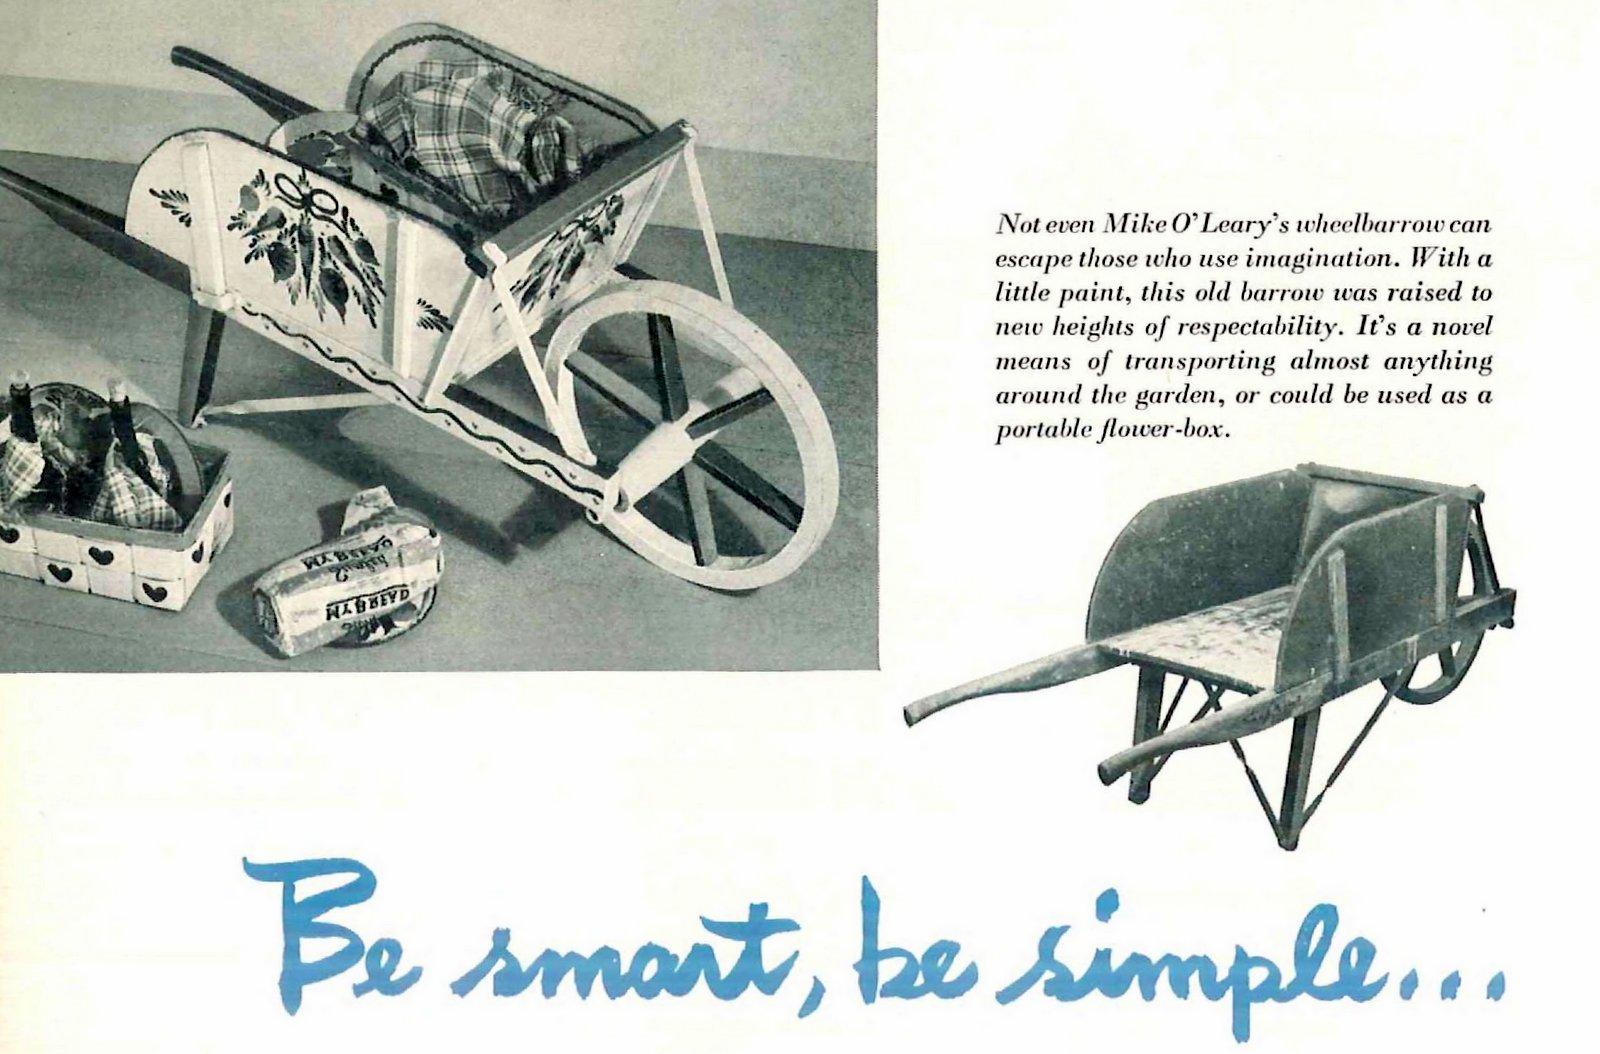 An old wheelbarrow reimagined with paint